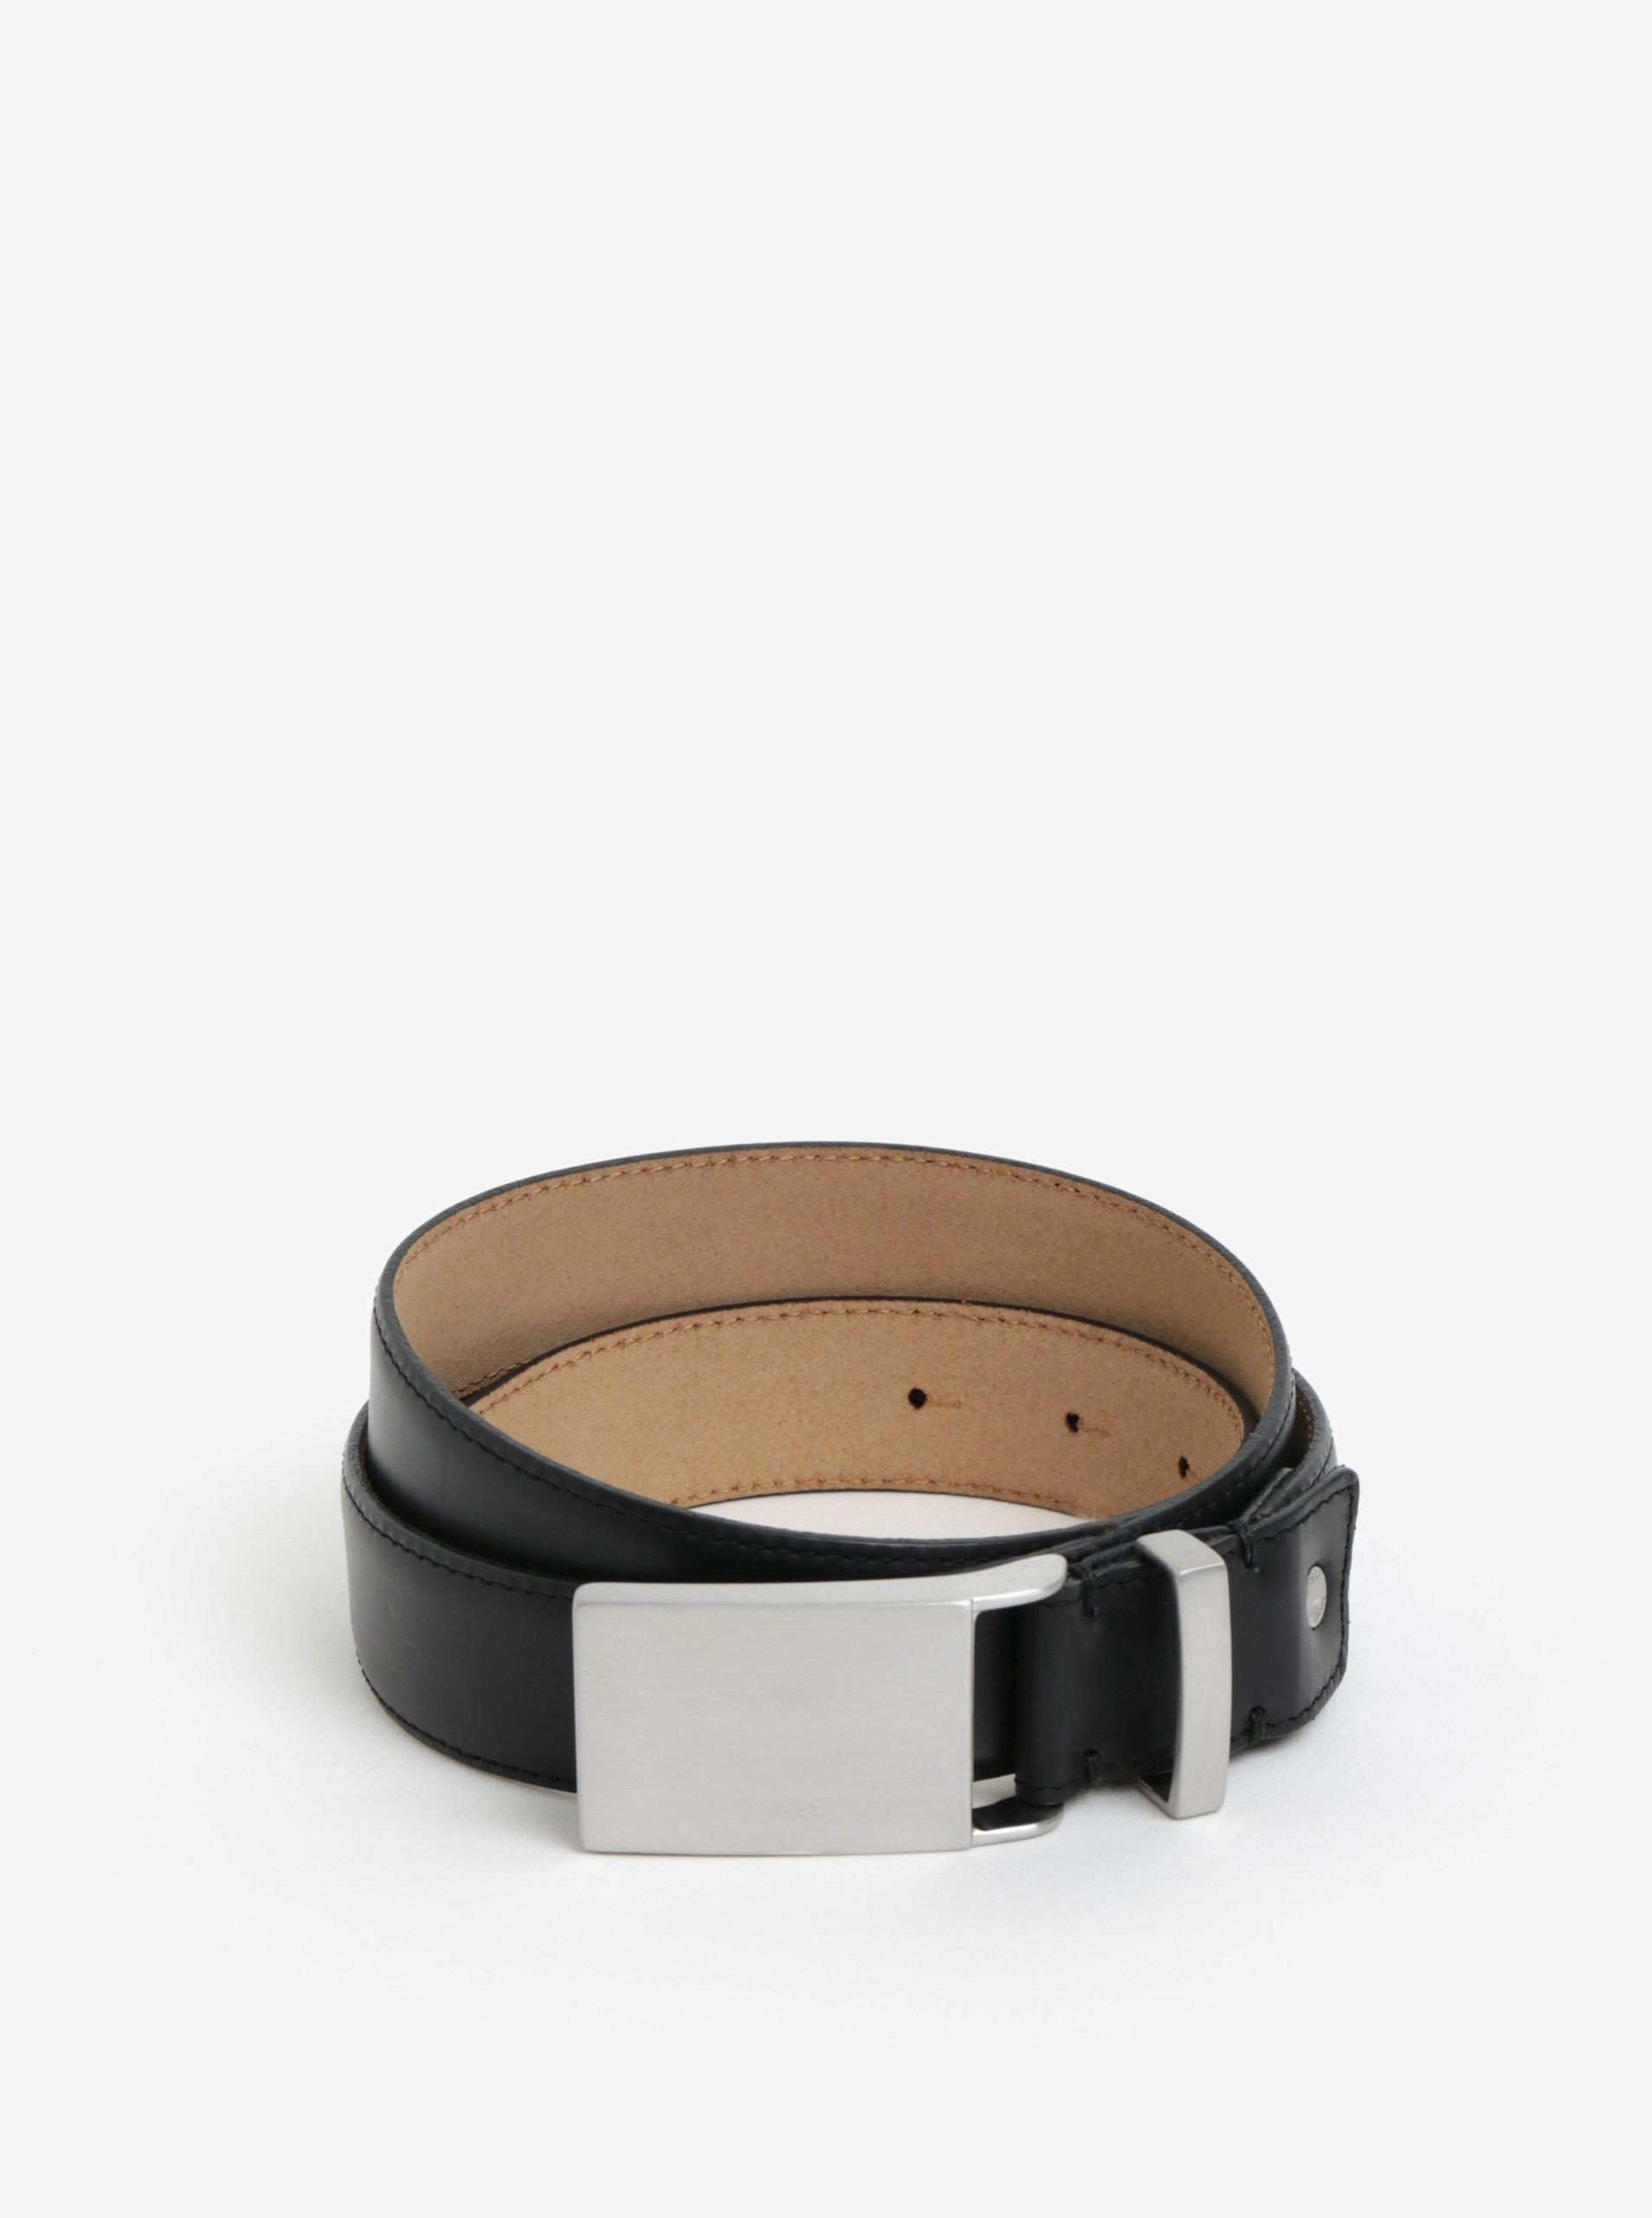 63257fd5268 Černý pánský kožený pásek Selected Homme Baxter